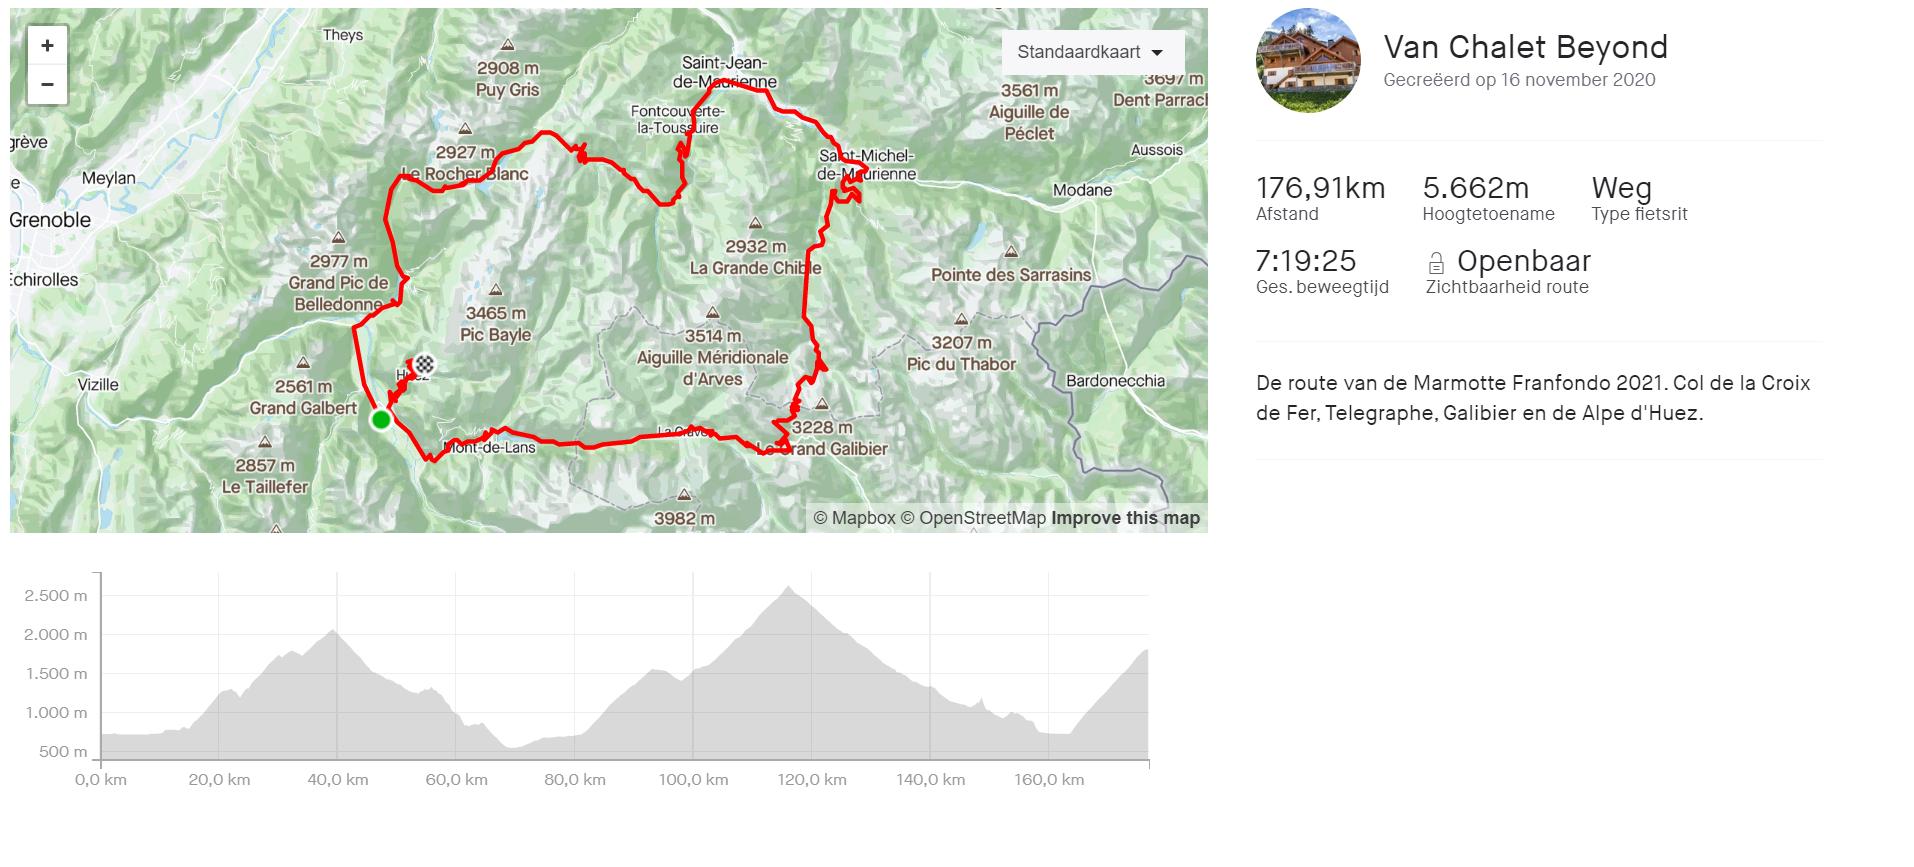 Marmotte 2021 route